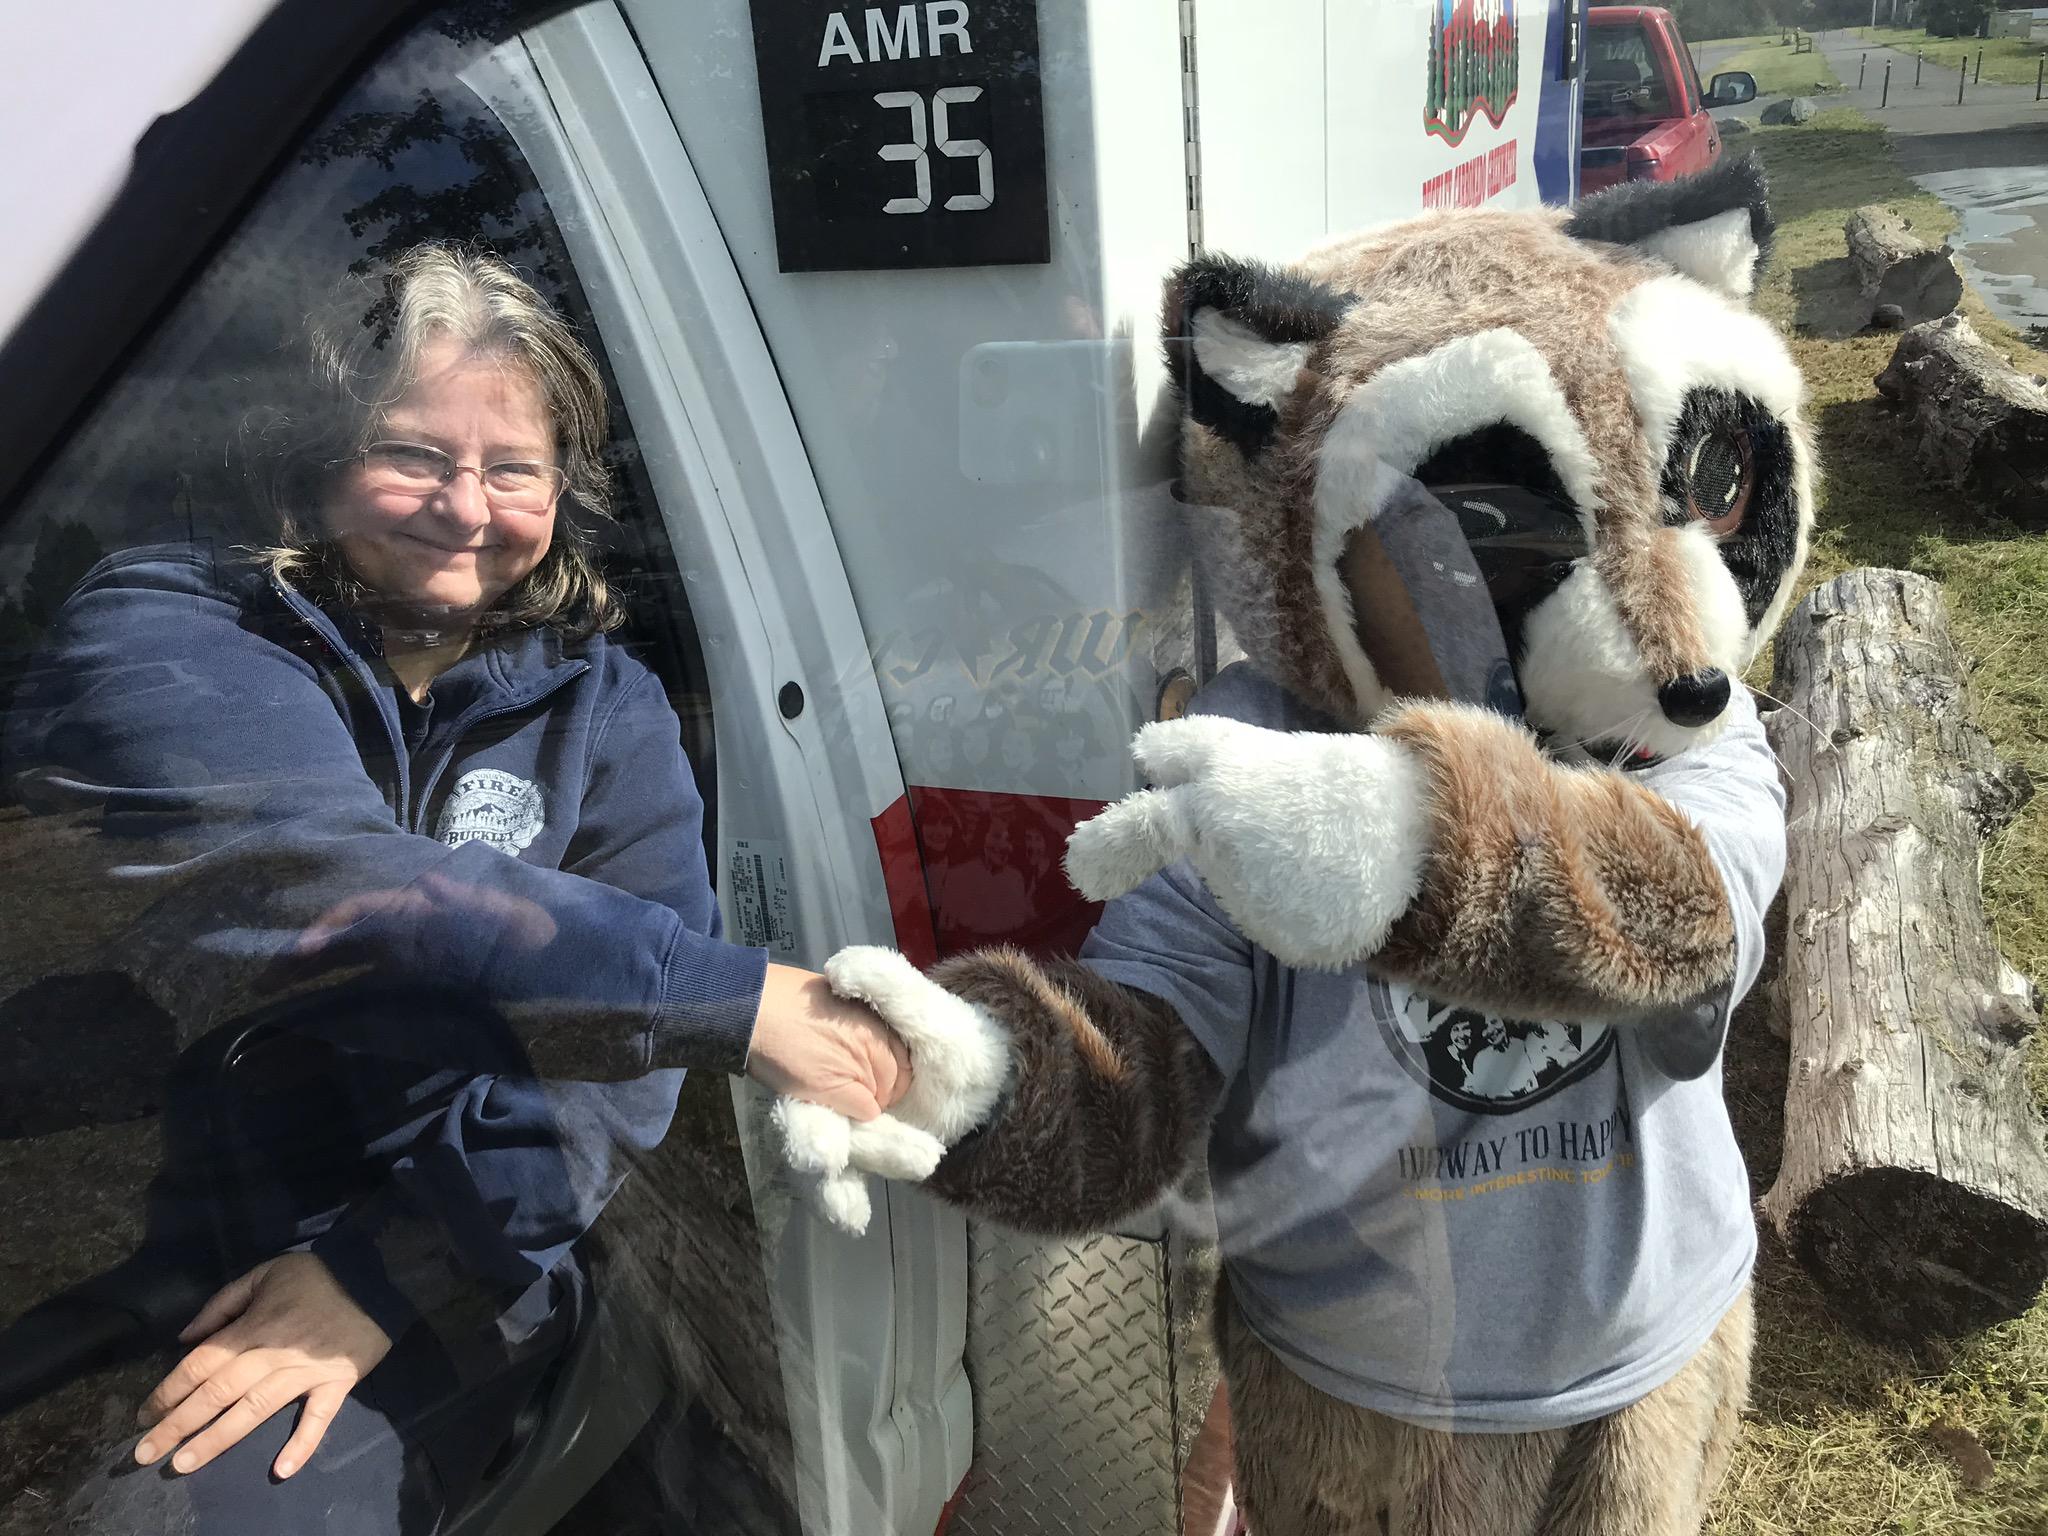 Rocky Raccoon shaking lady's hand